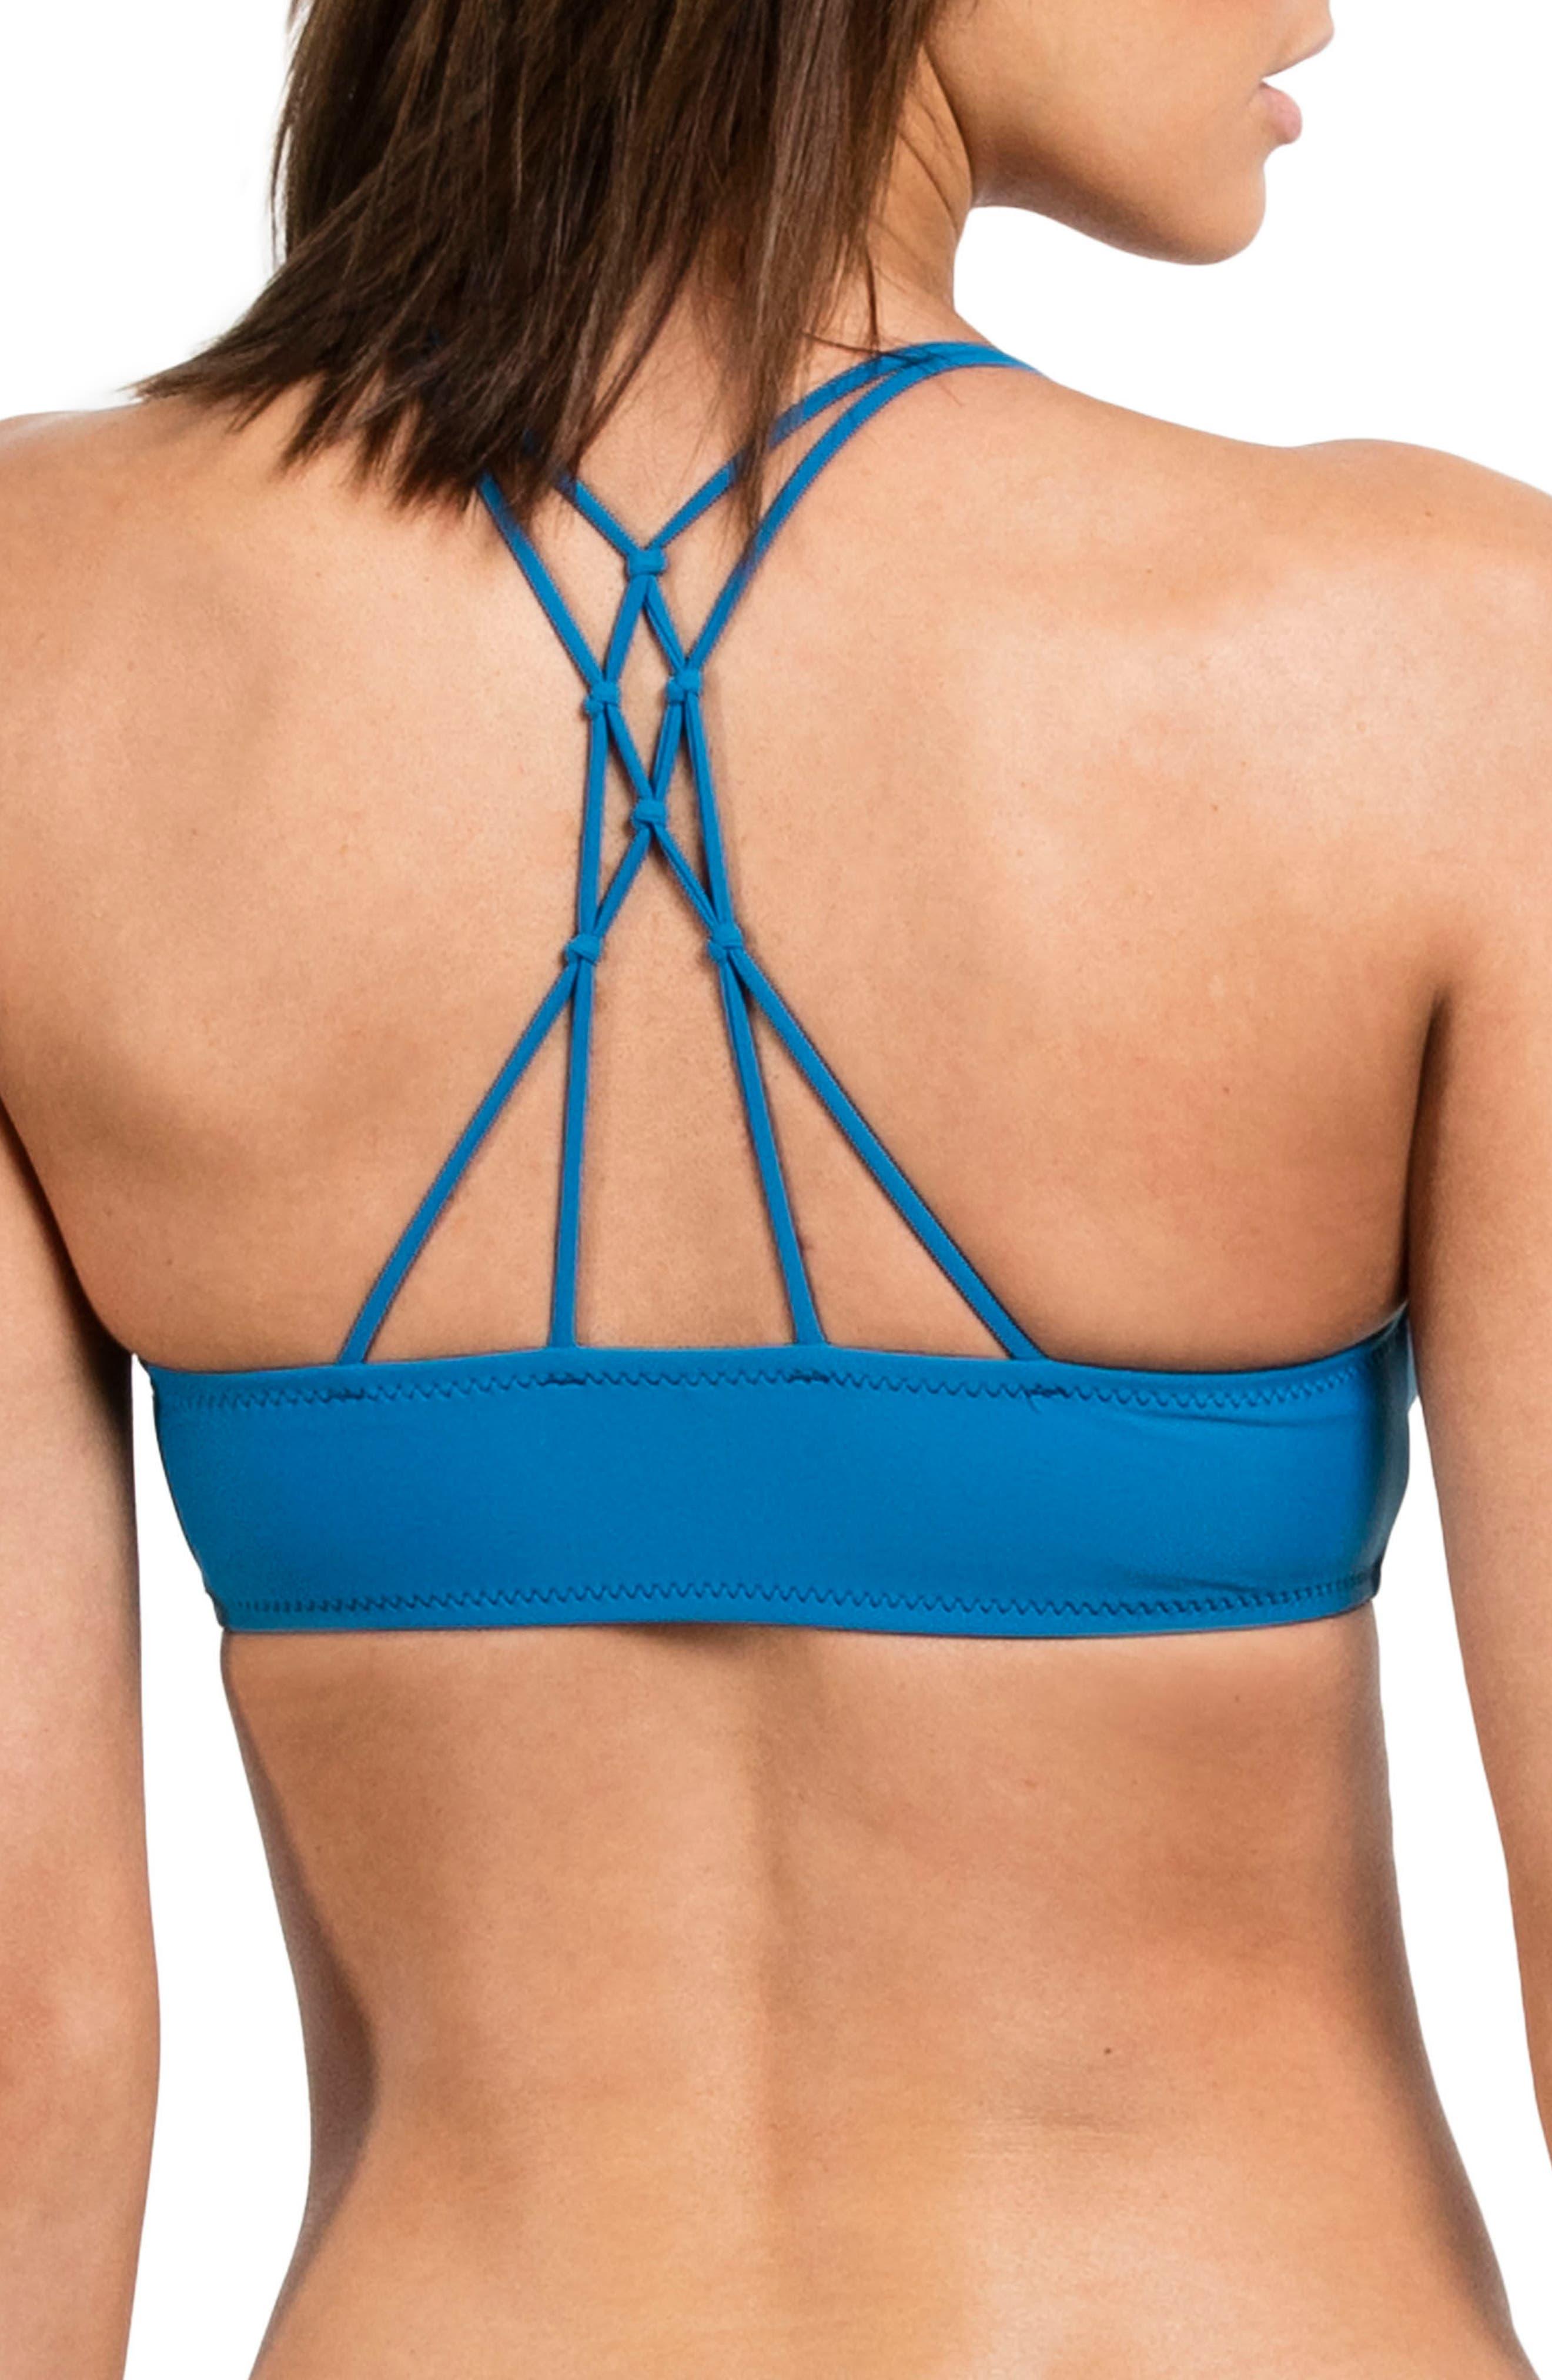 Simply Solid V-Neck Bikini Top,                             Alternate thumbnail 2, color,                             Ocean Blue